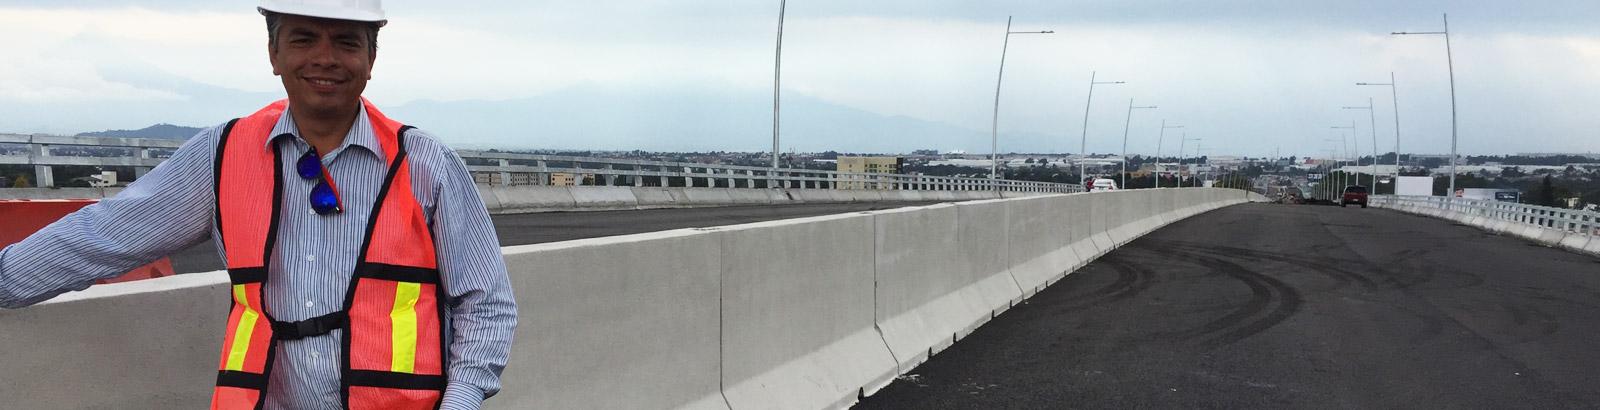 Barrera Central de concreto